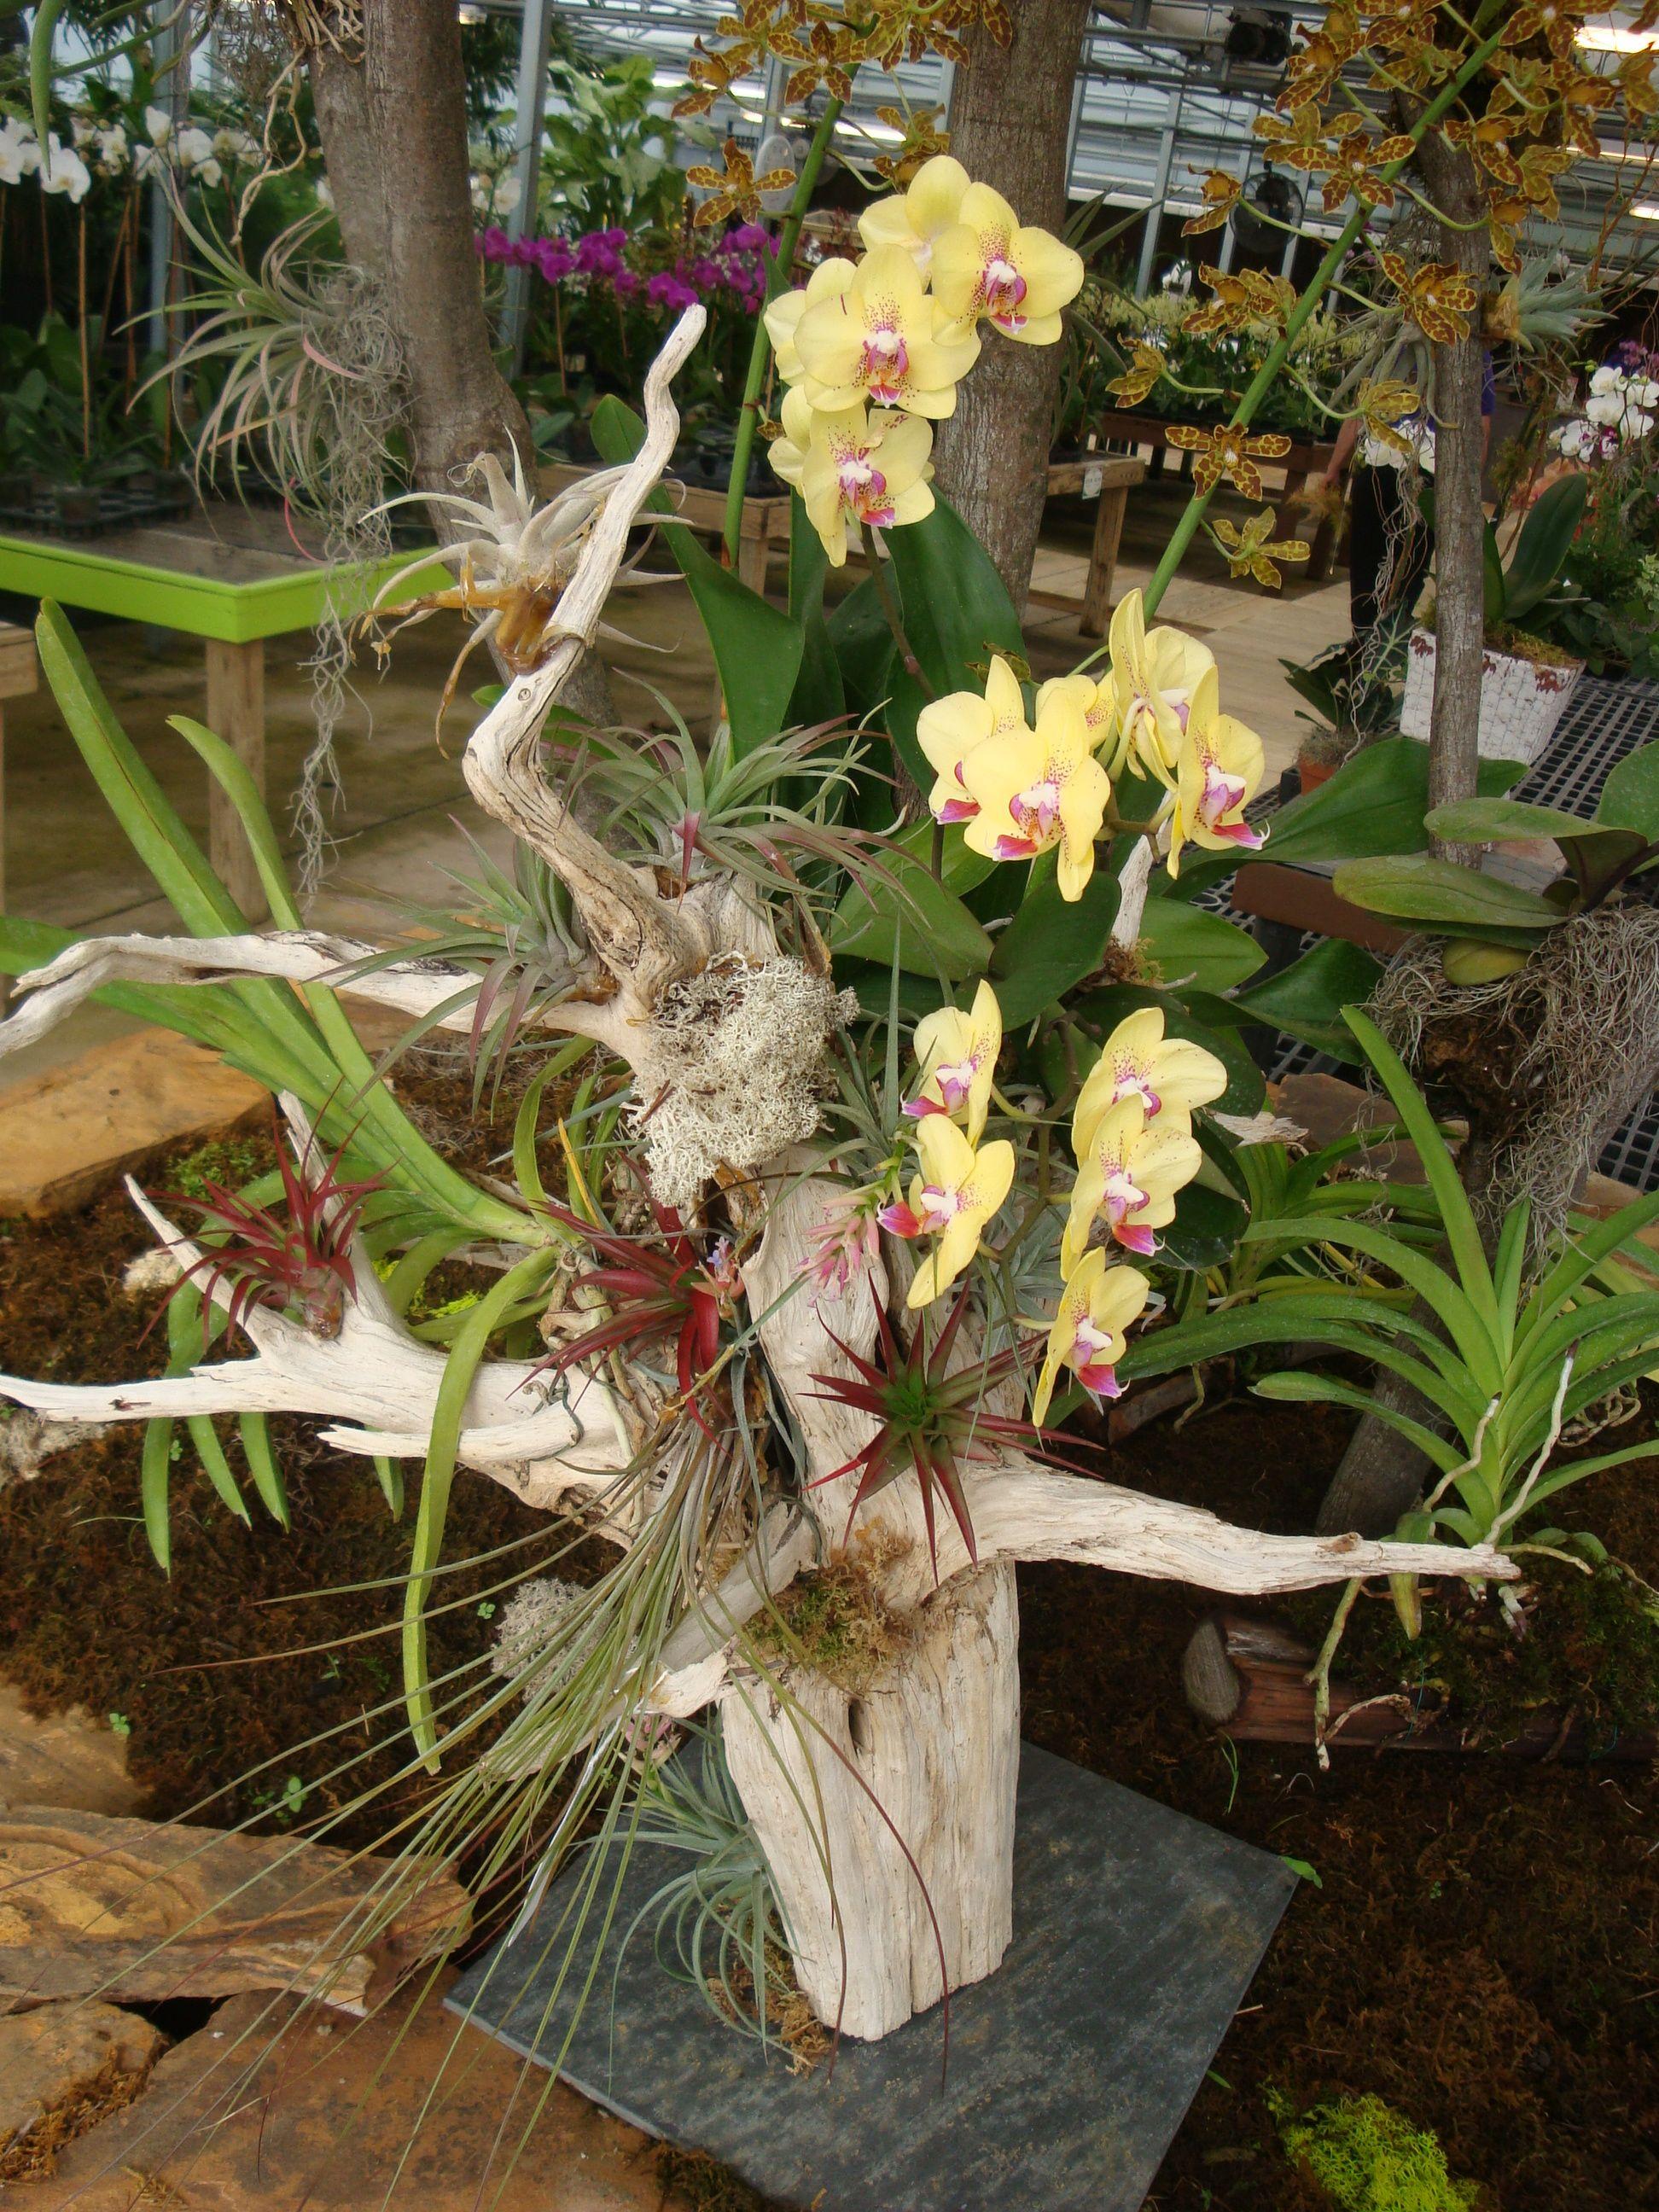 Orchid U0026 Tillandsia Arrangement On Driftwood